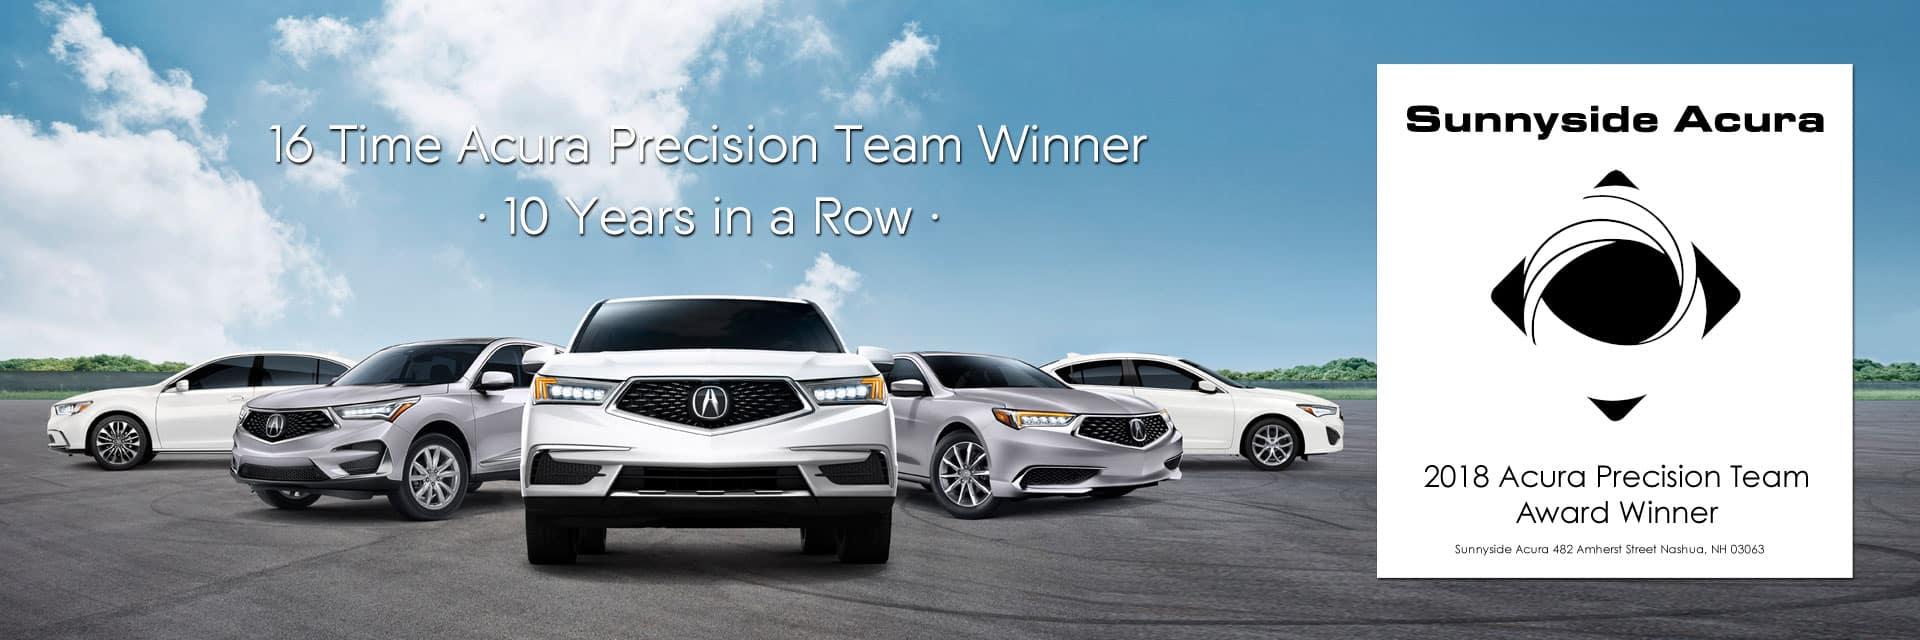 Acura Precision Team Winner Sunnyside Acura Nashua NH